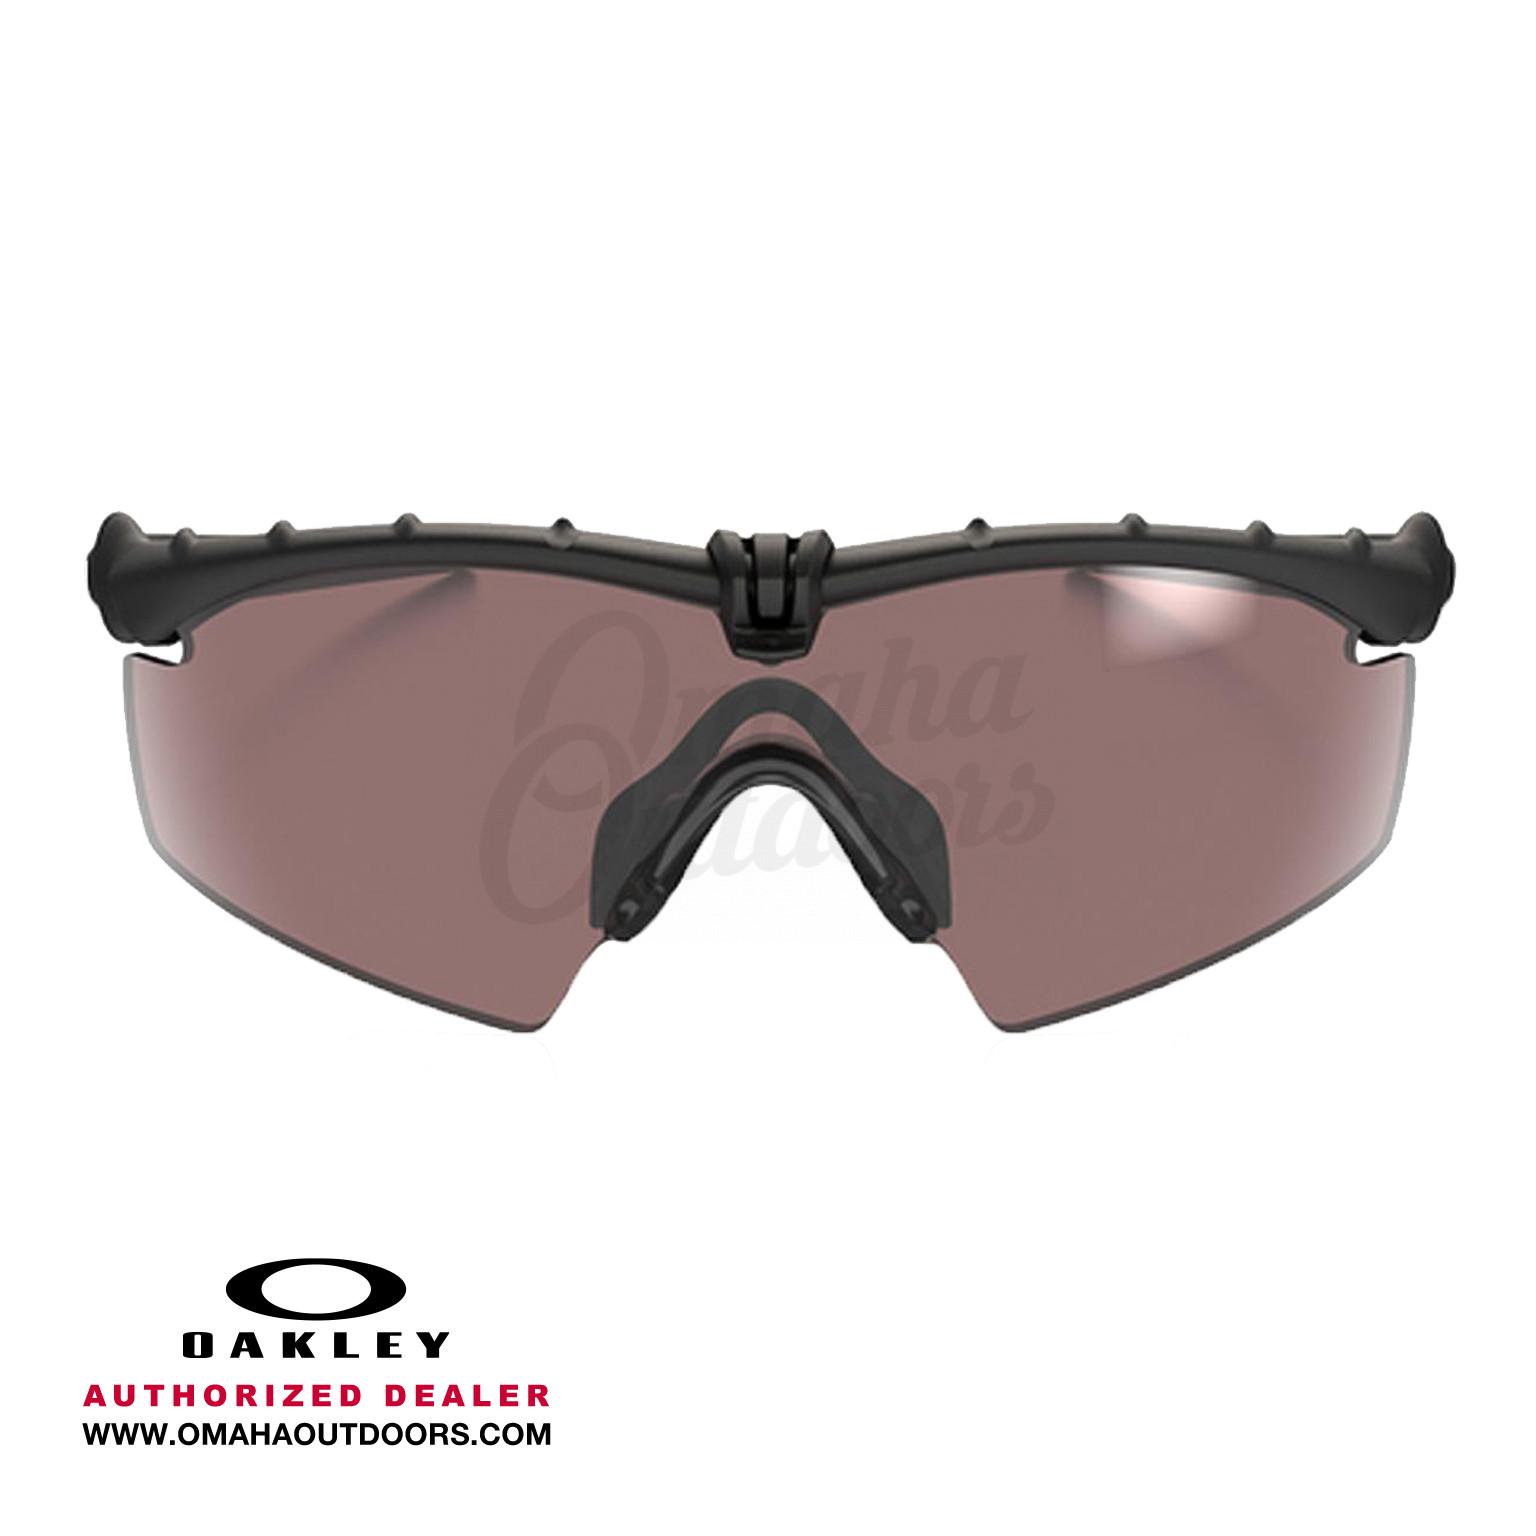 Oakley SI Ballistic M Frame 3.0 Safety Eyeglasses Prizm Gray Lens ...